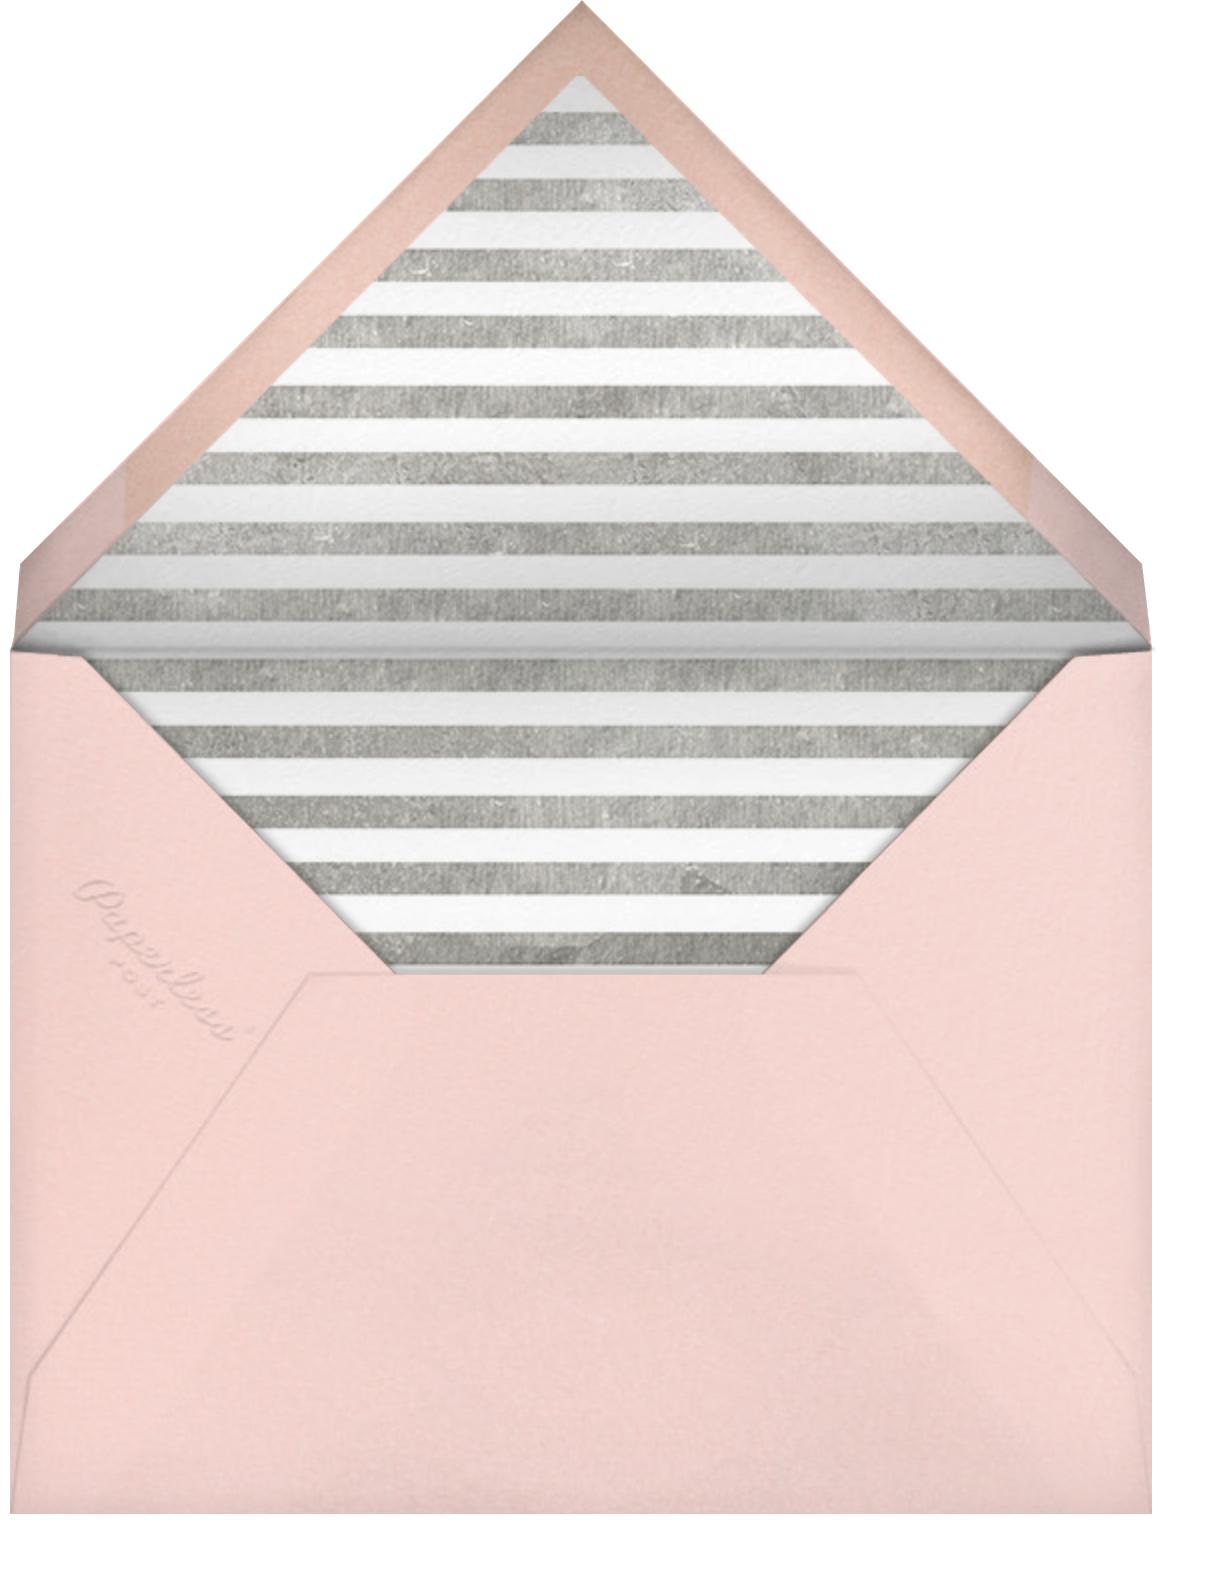 Decade Photo (Twenty-One) - Silver - Paperless Post - Envelope